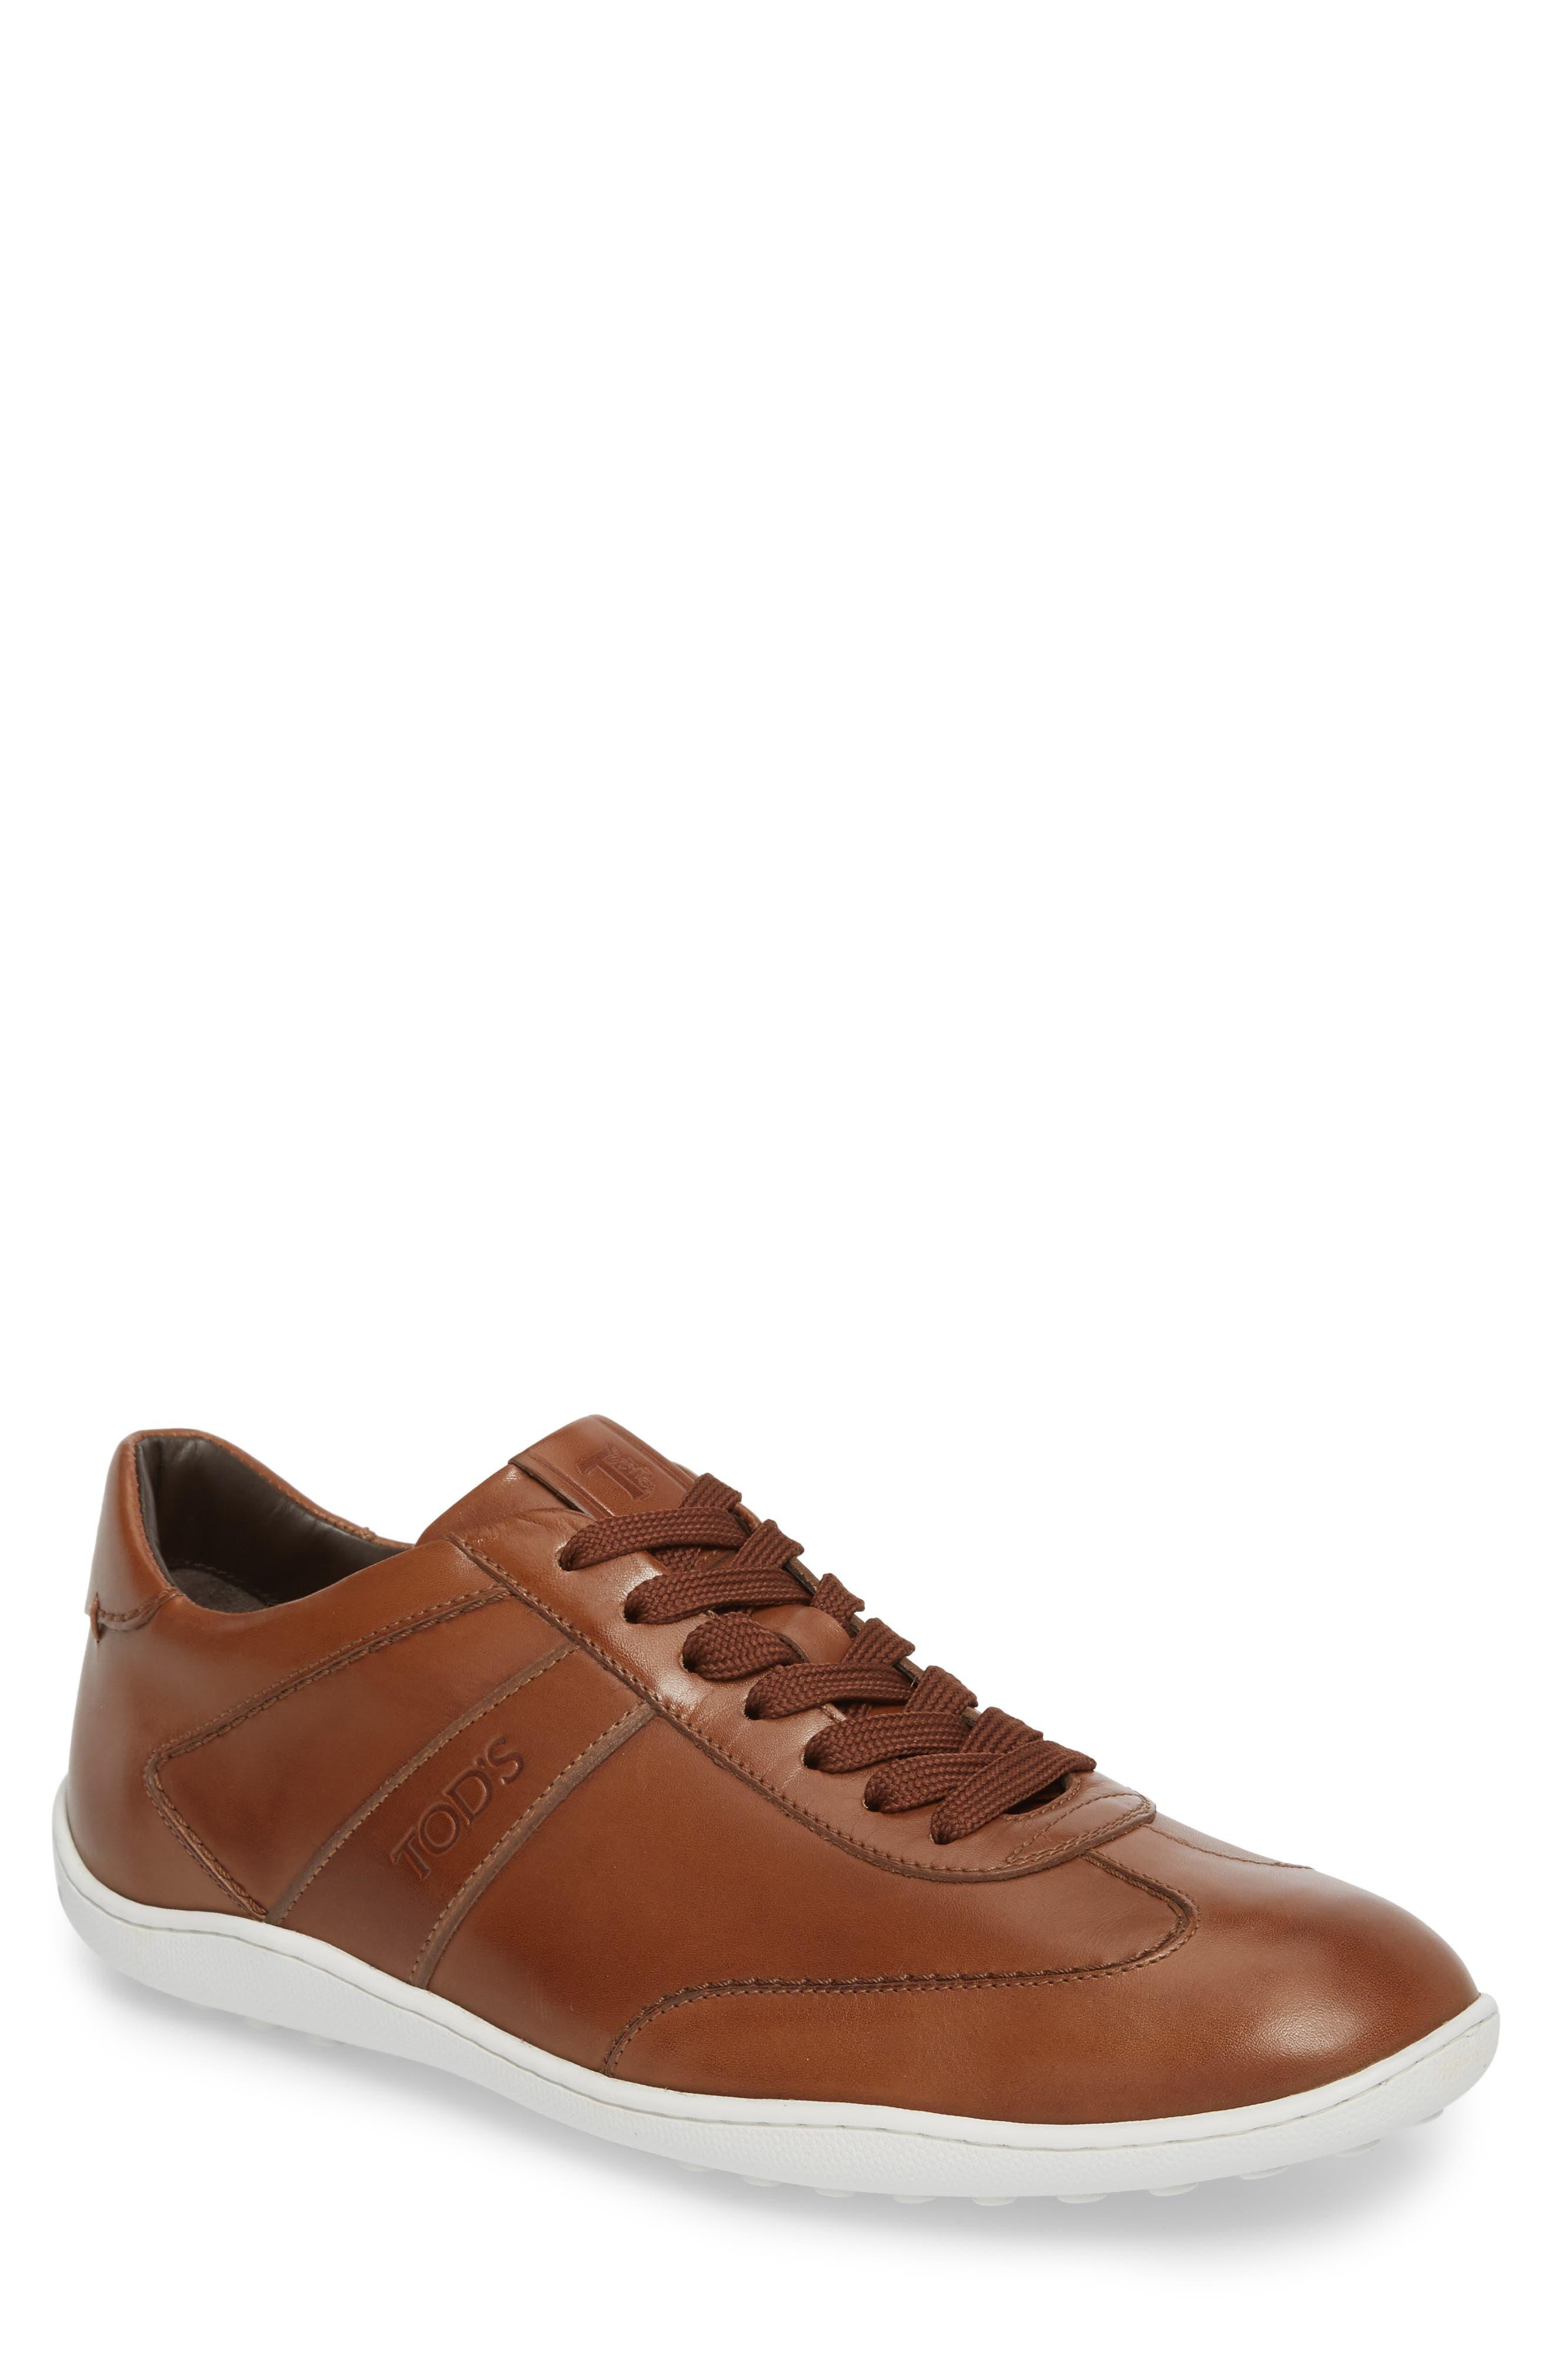 Main Image - Tod's Owen Sneaker (Men)